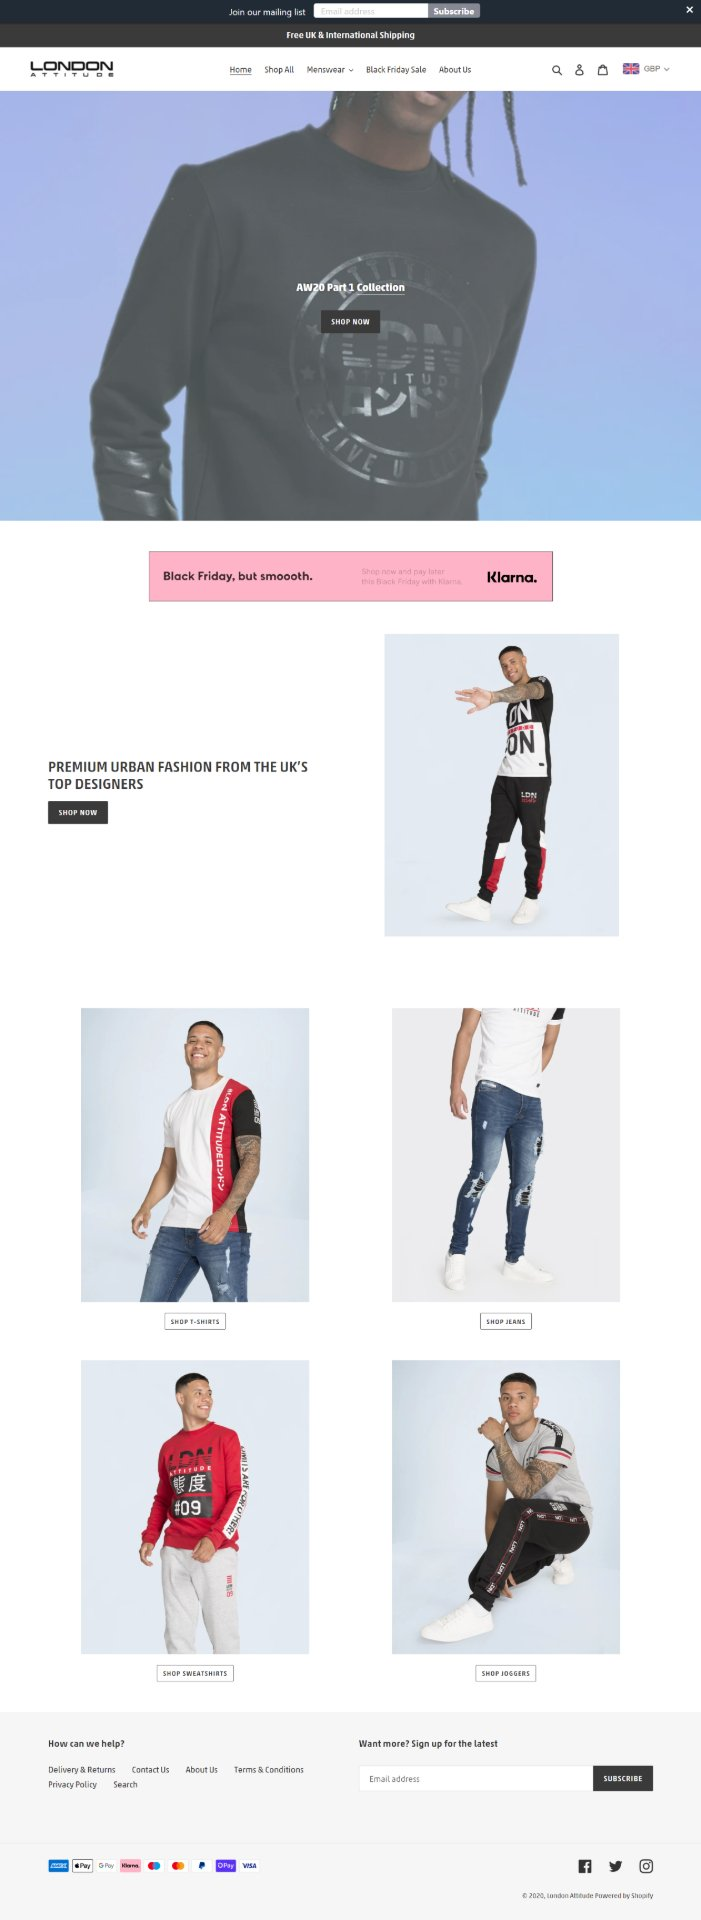 urban-street-wear-london-fashion-ecommerce